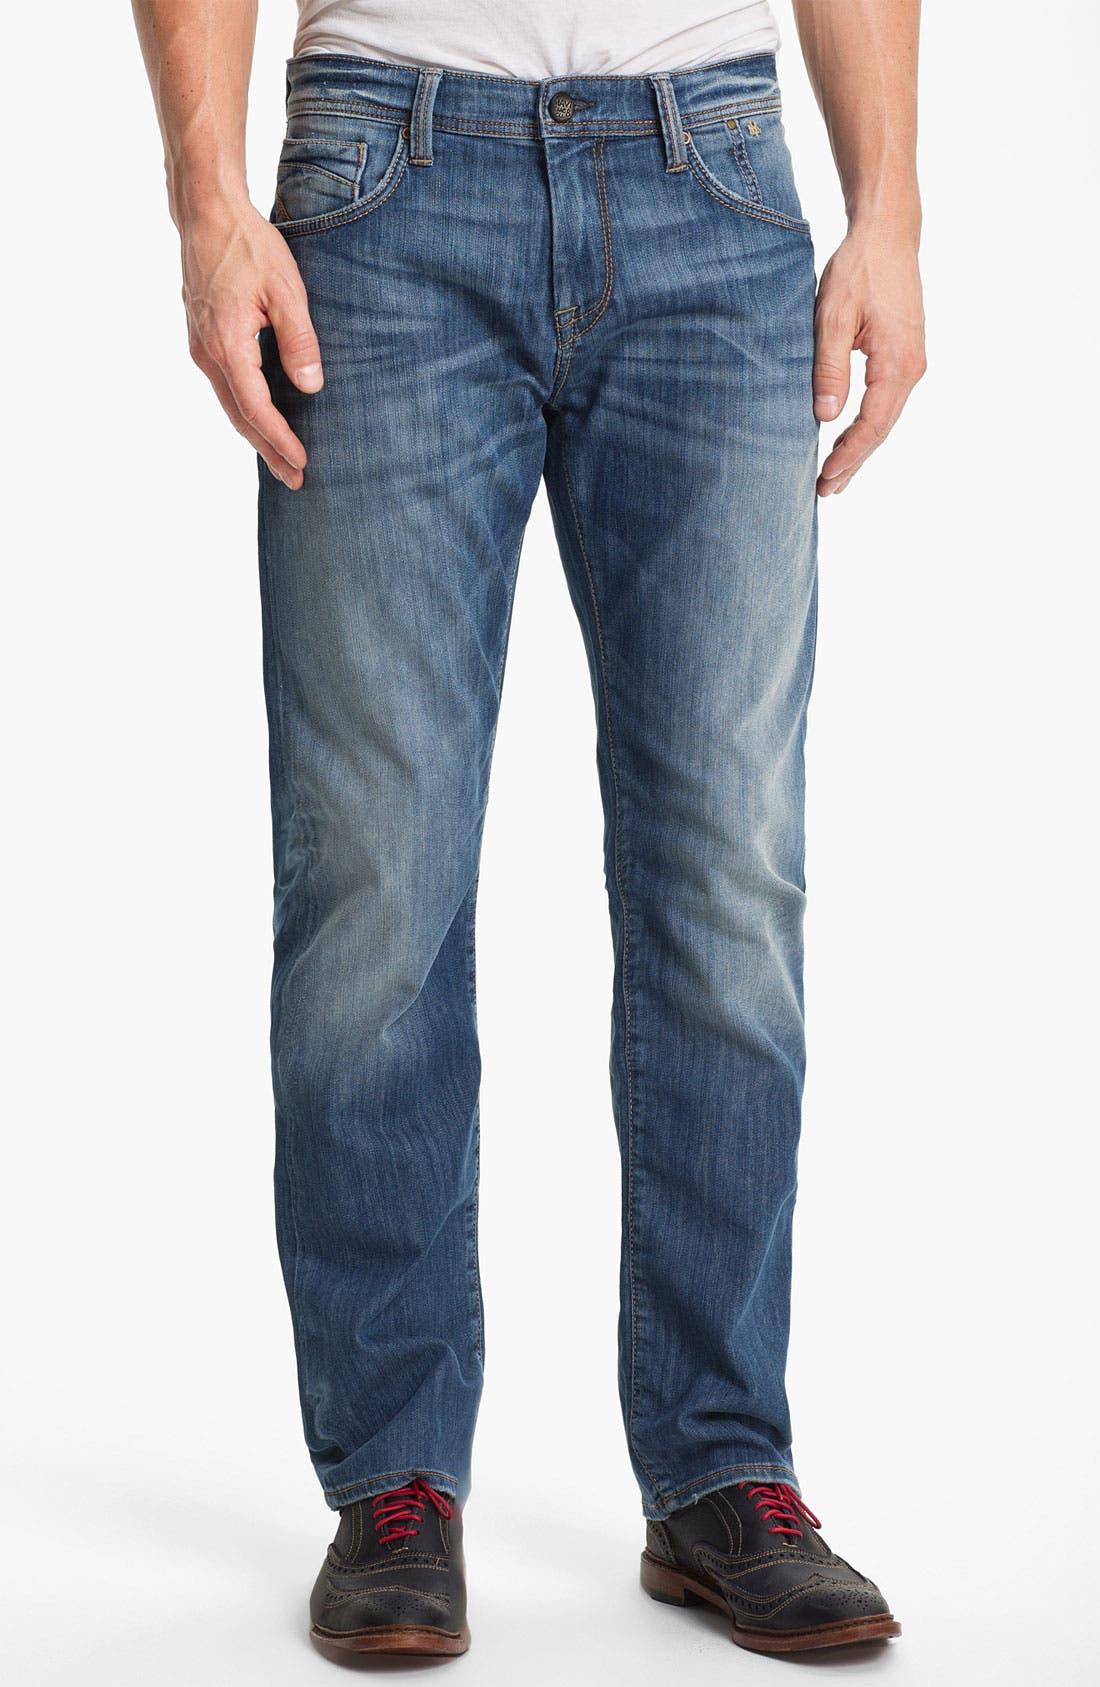 Main Image - Mavi Jeans 'Zach' Straight Leg Jeans (Light Cooper)